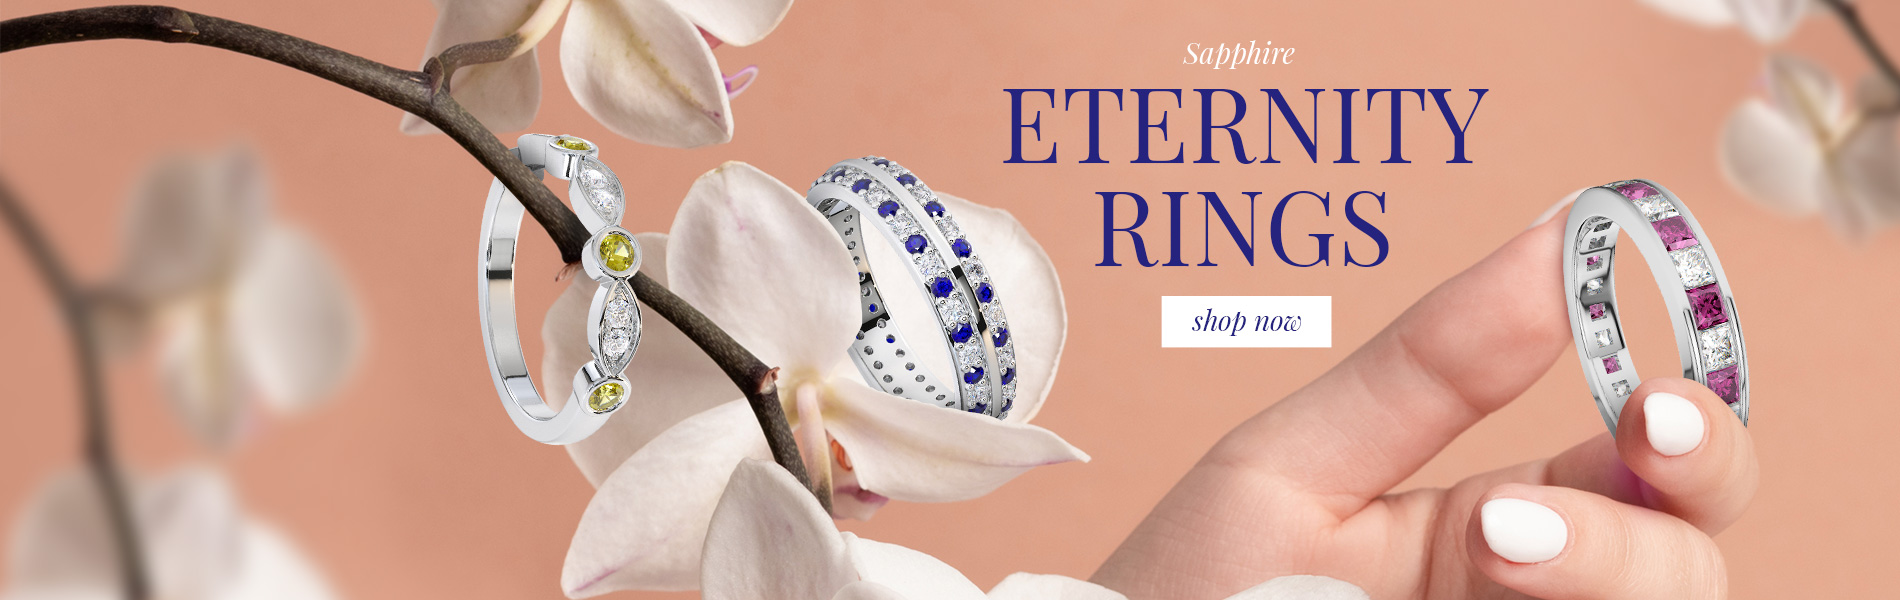 Sapphire Eternity Rings